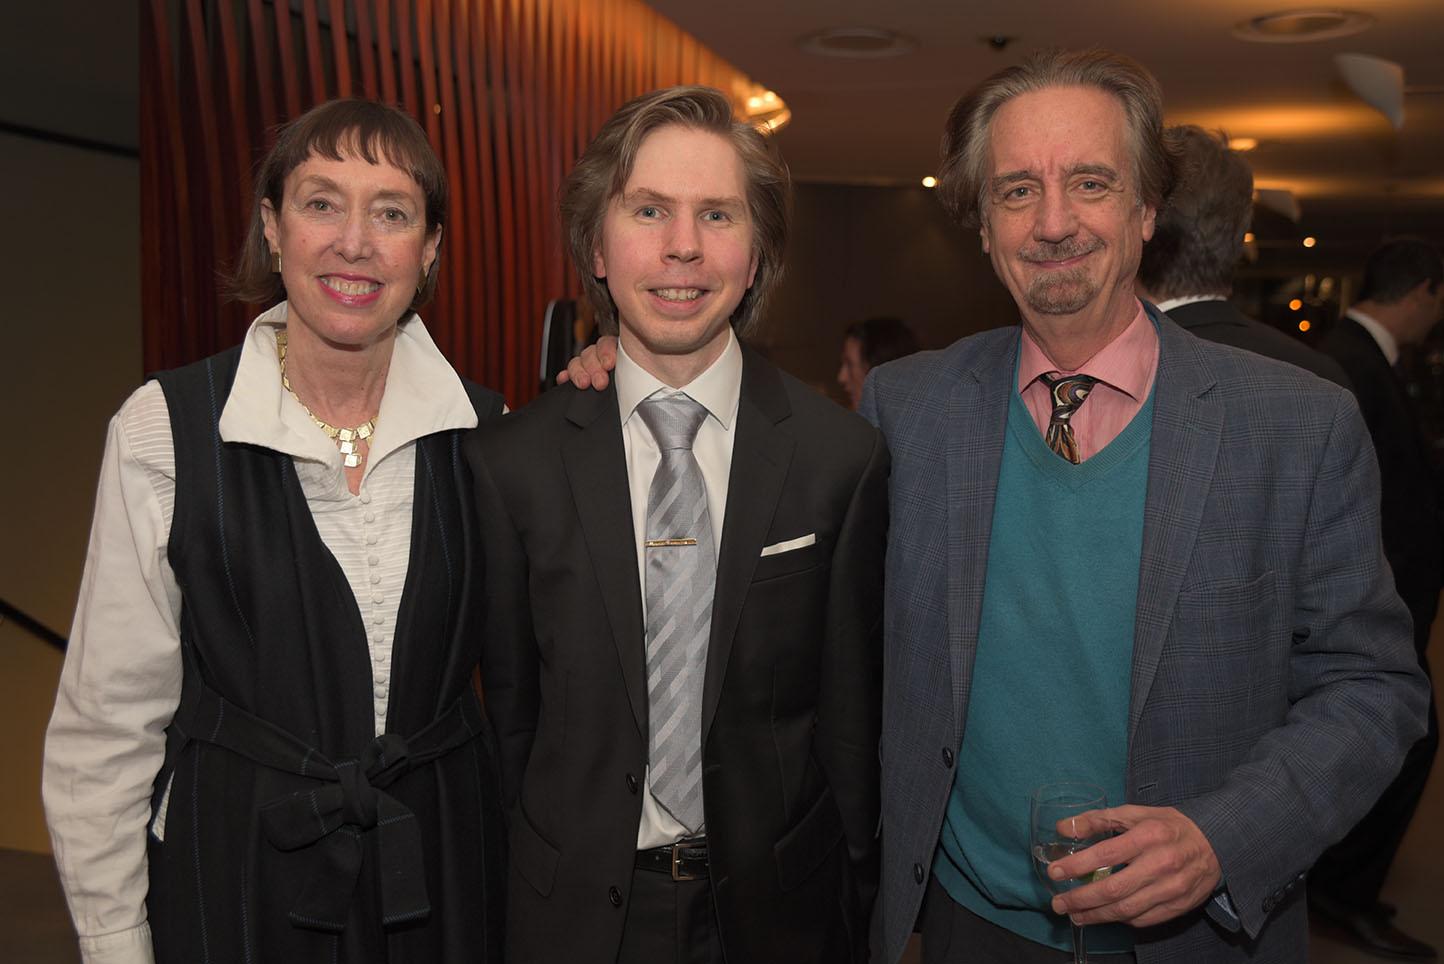 CMS Executive Director Suzanne Davidson, Juho Pojhonen, CMS Artistic Director David Finckel